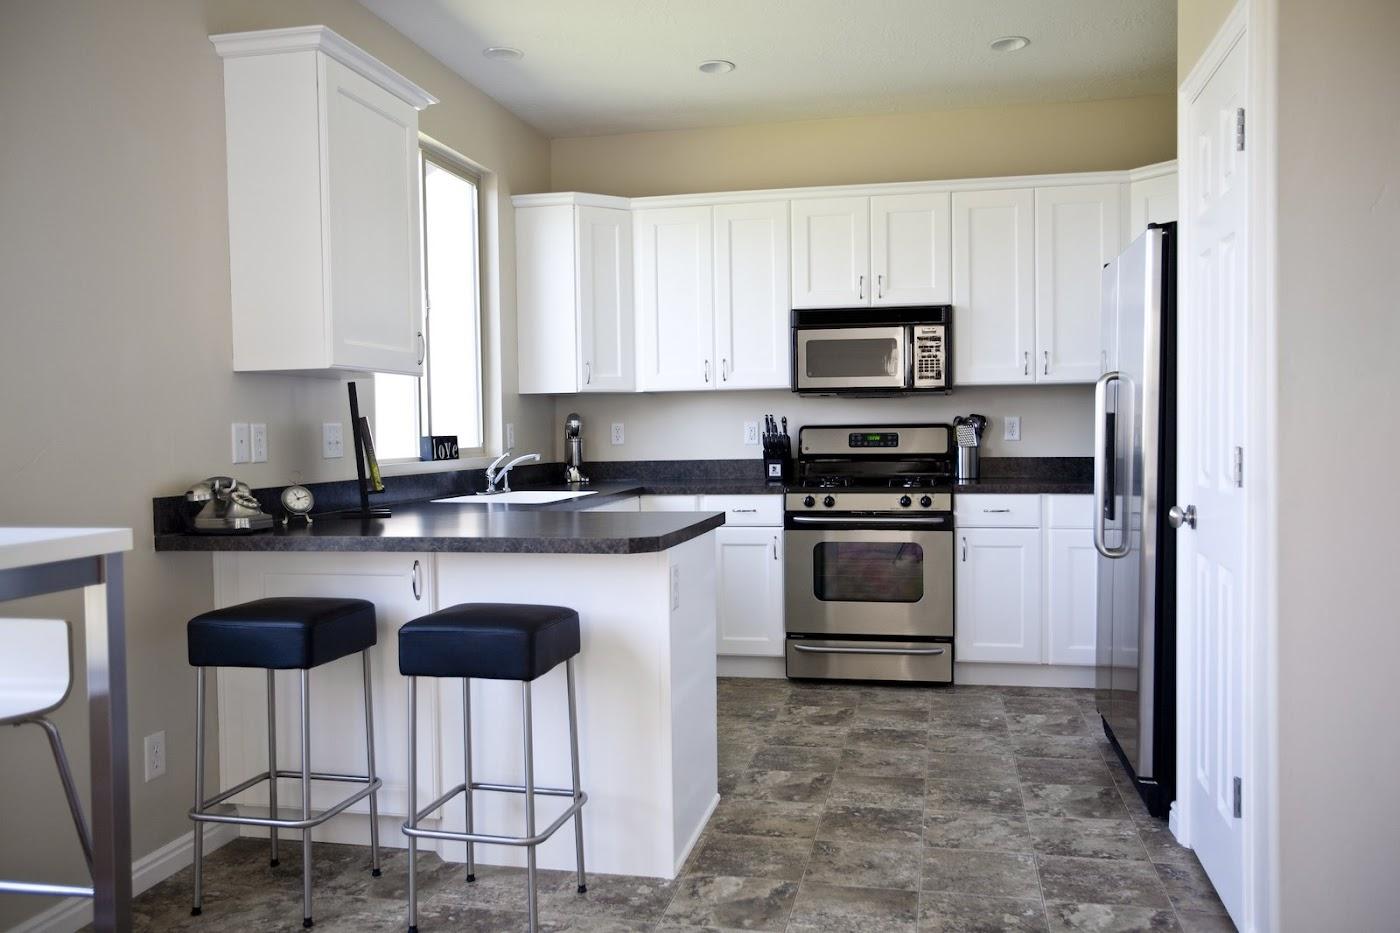 Resepi Nannie Kuzaifah Idea Untuk Kabi Dapur Sendiri